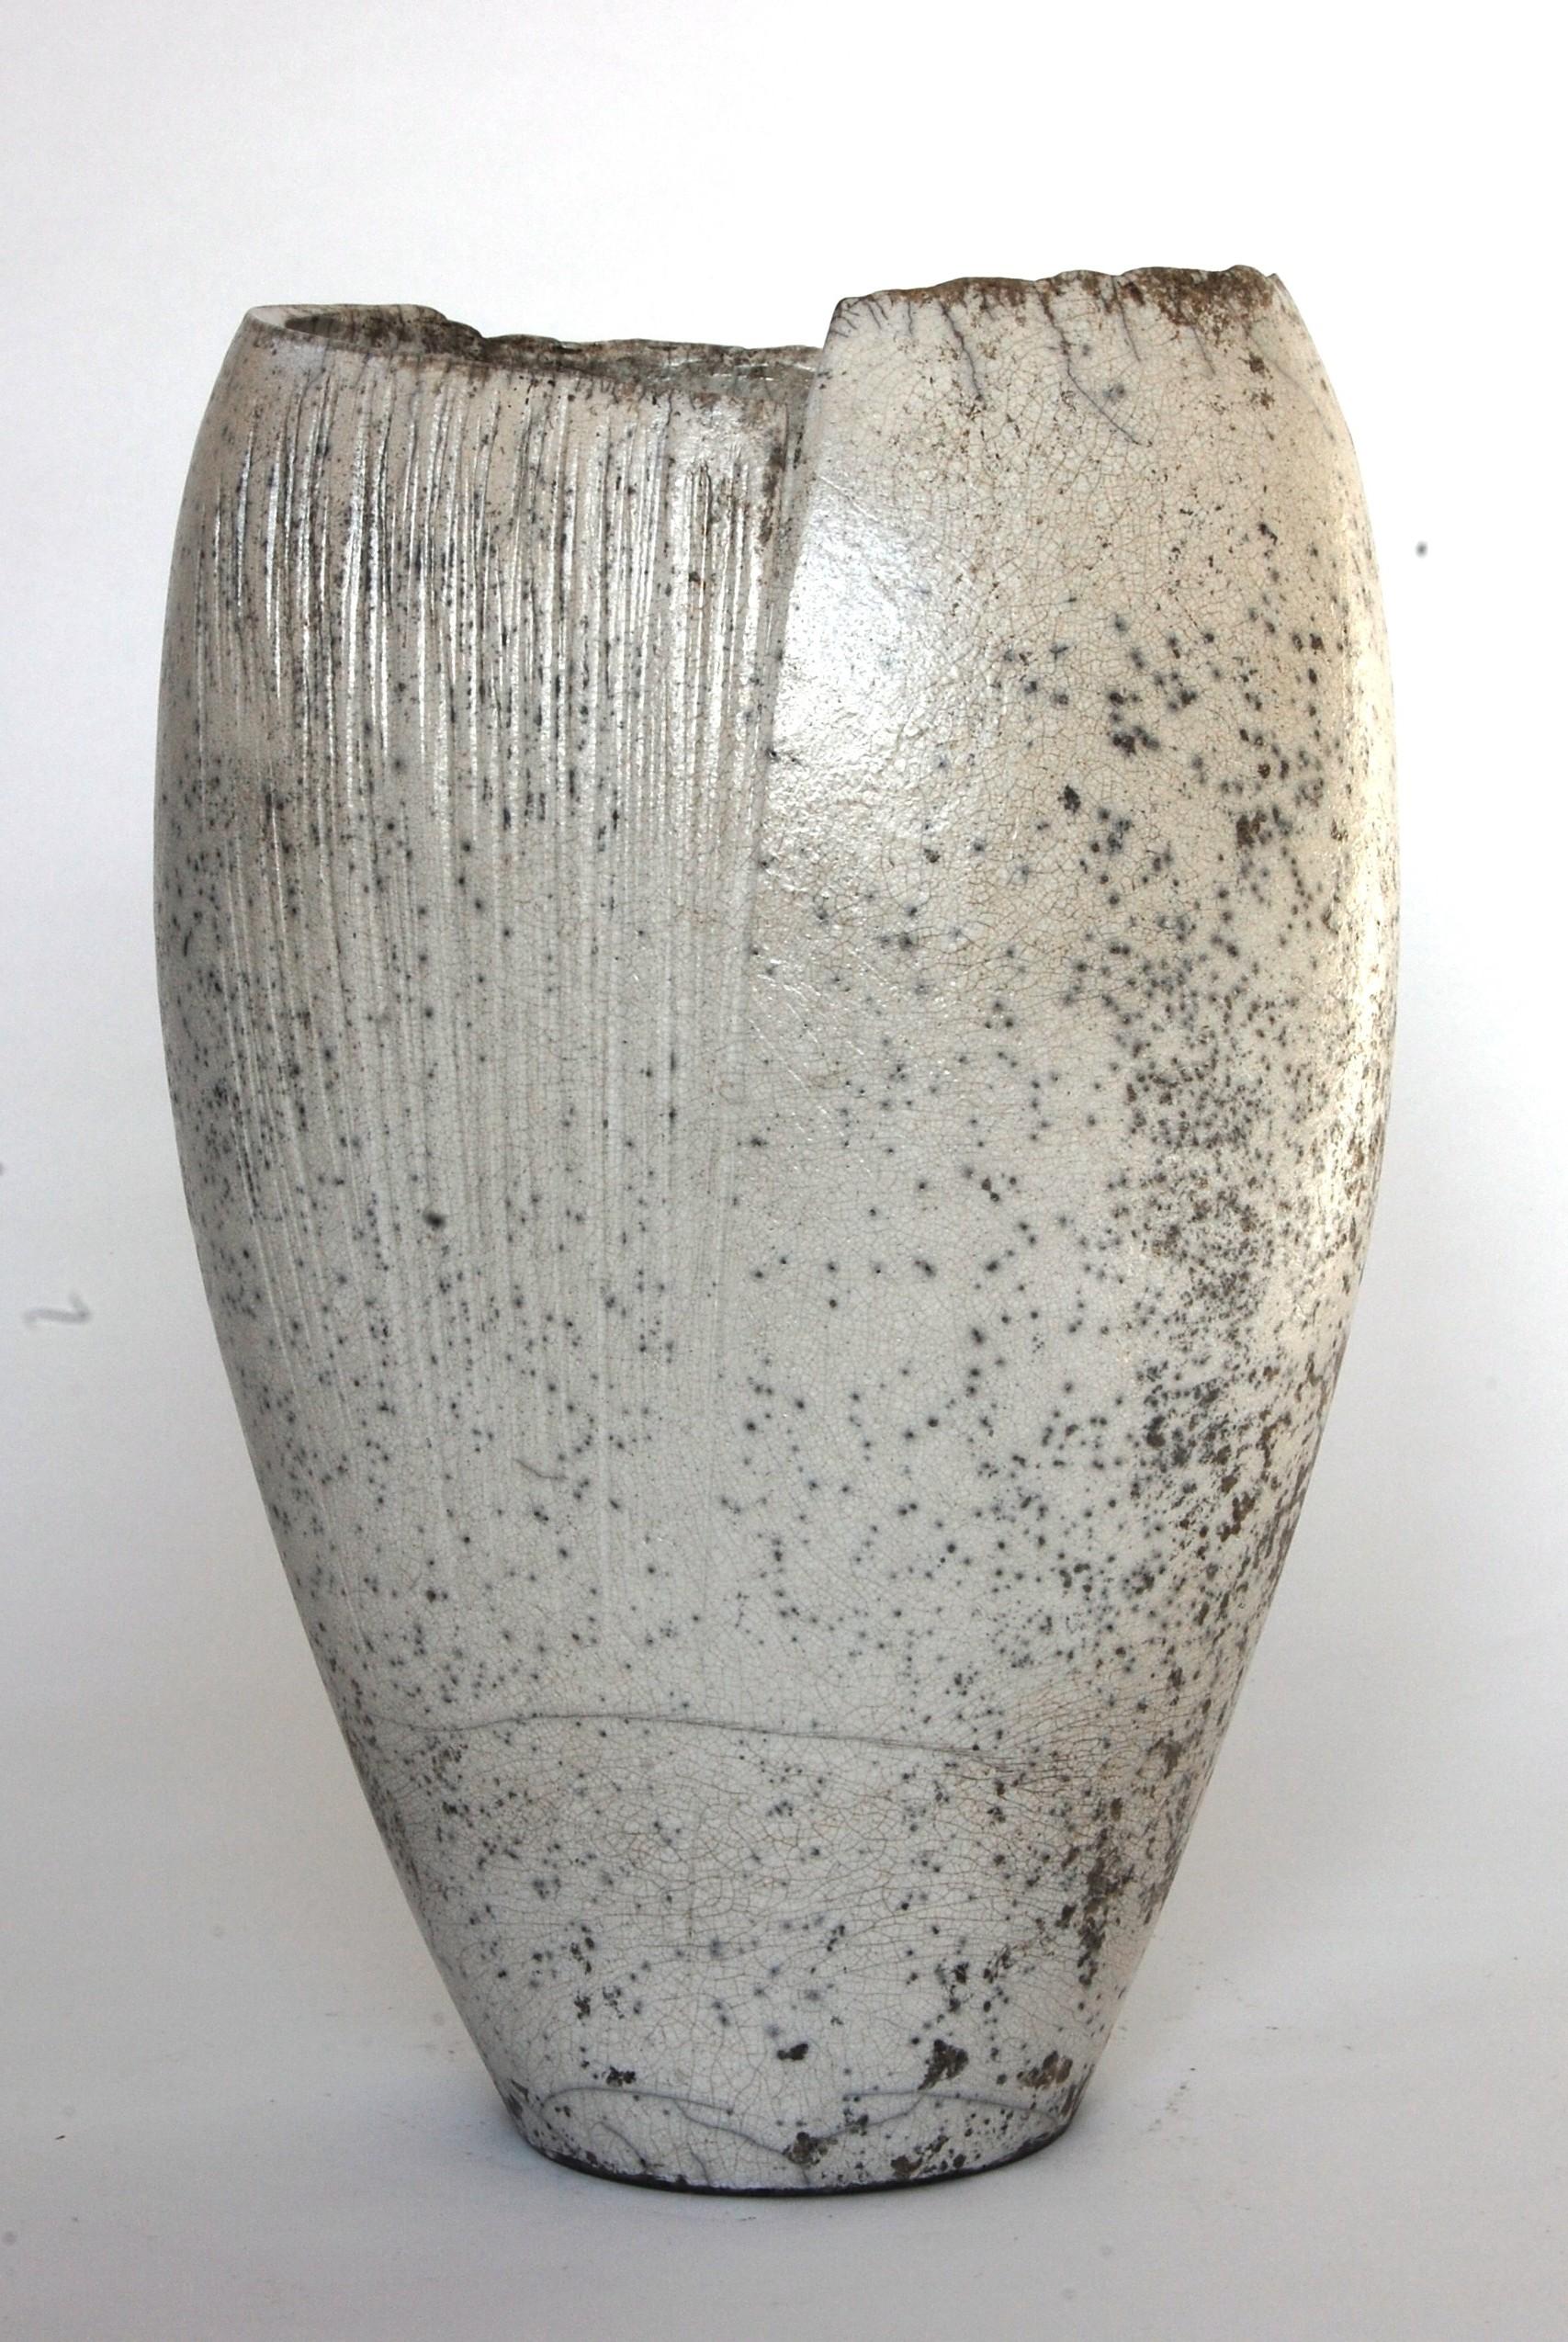 White Textured Vessel - SOLD